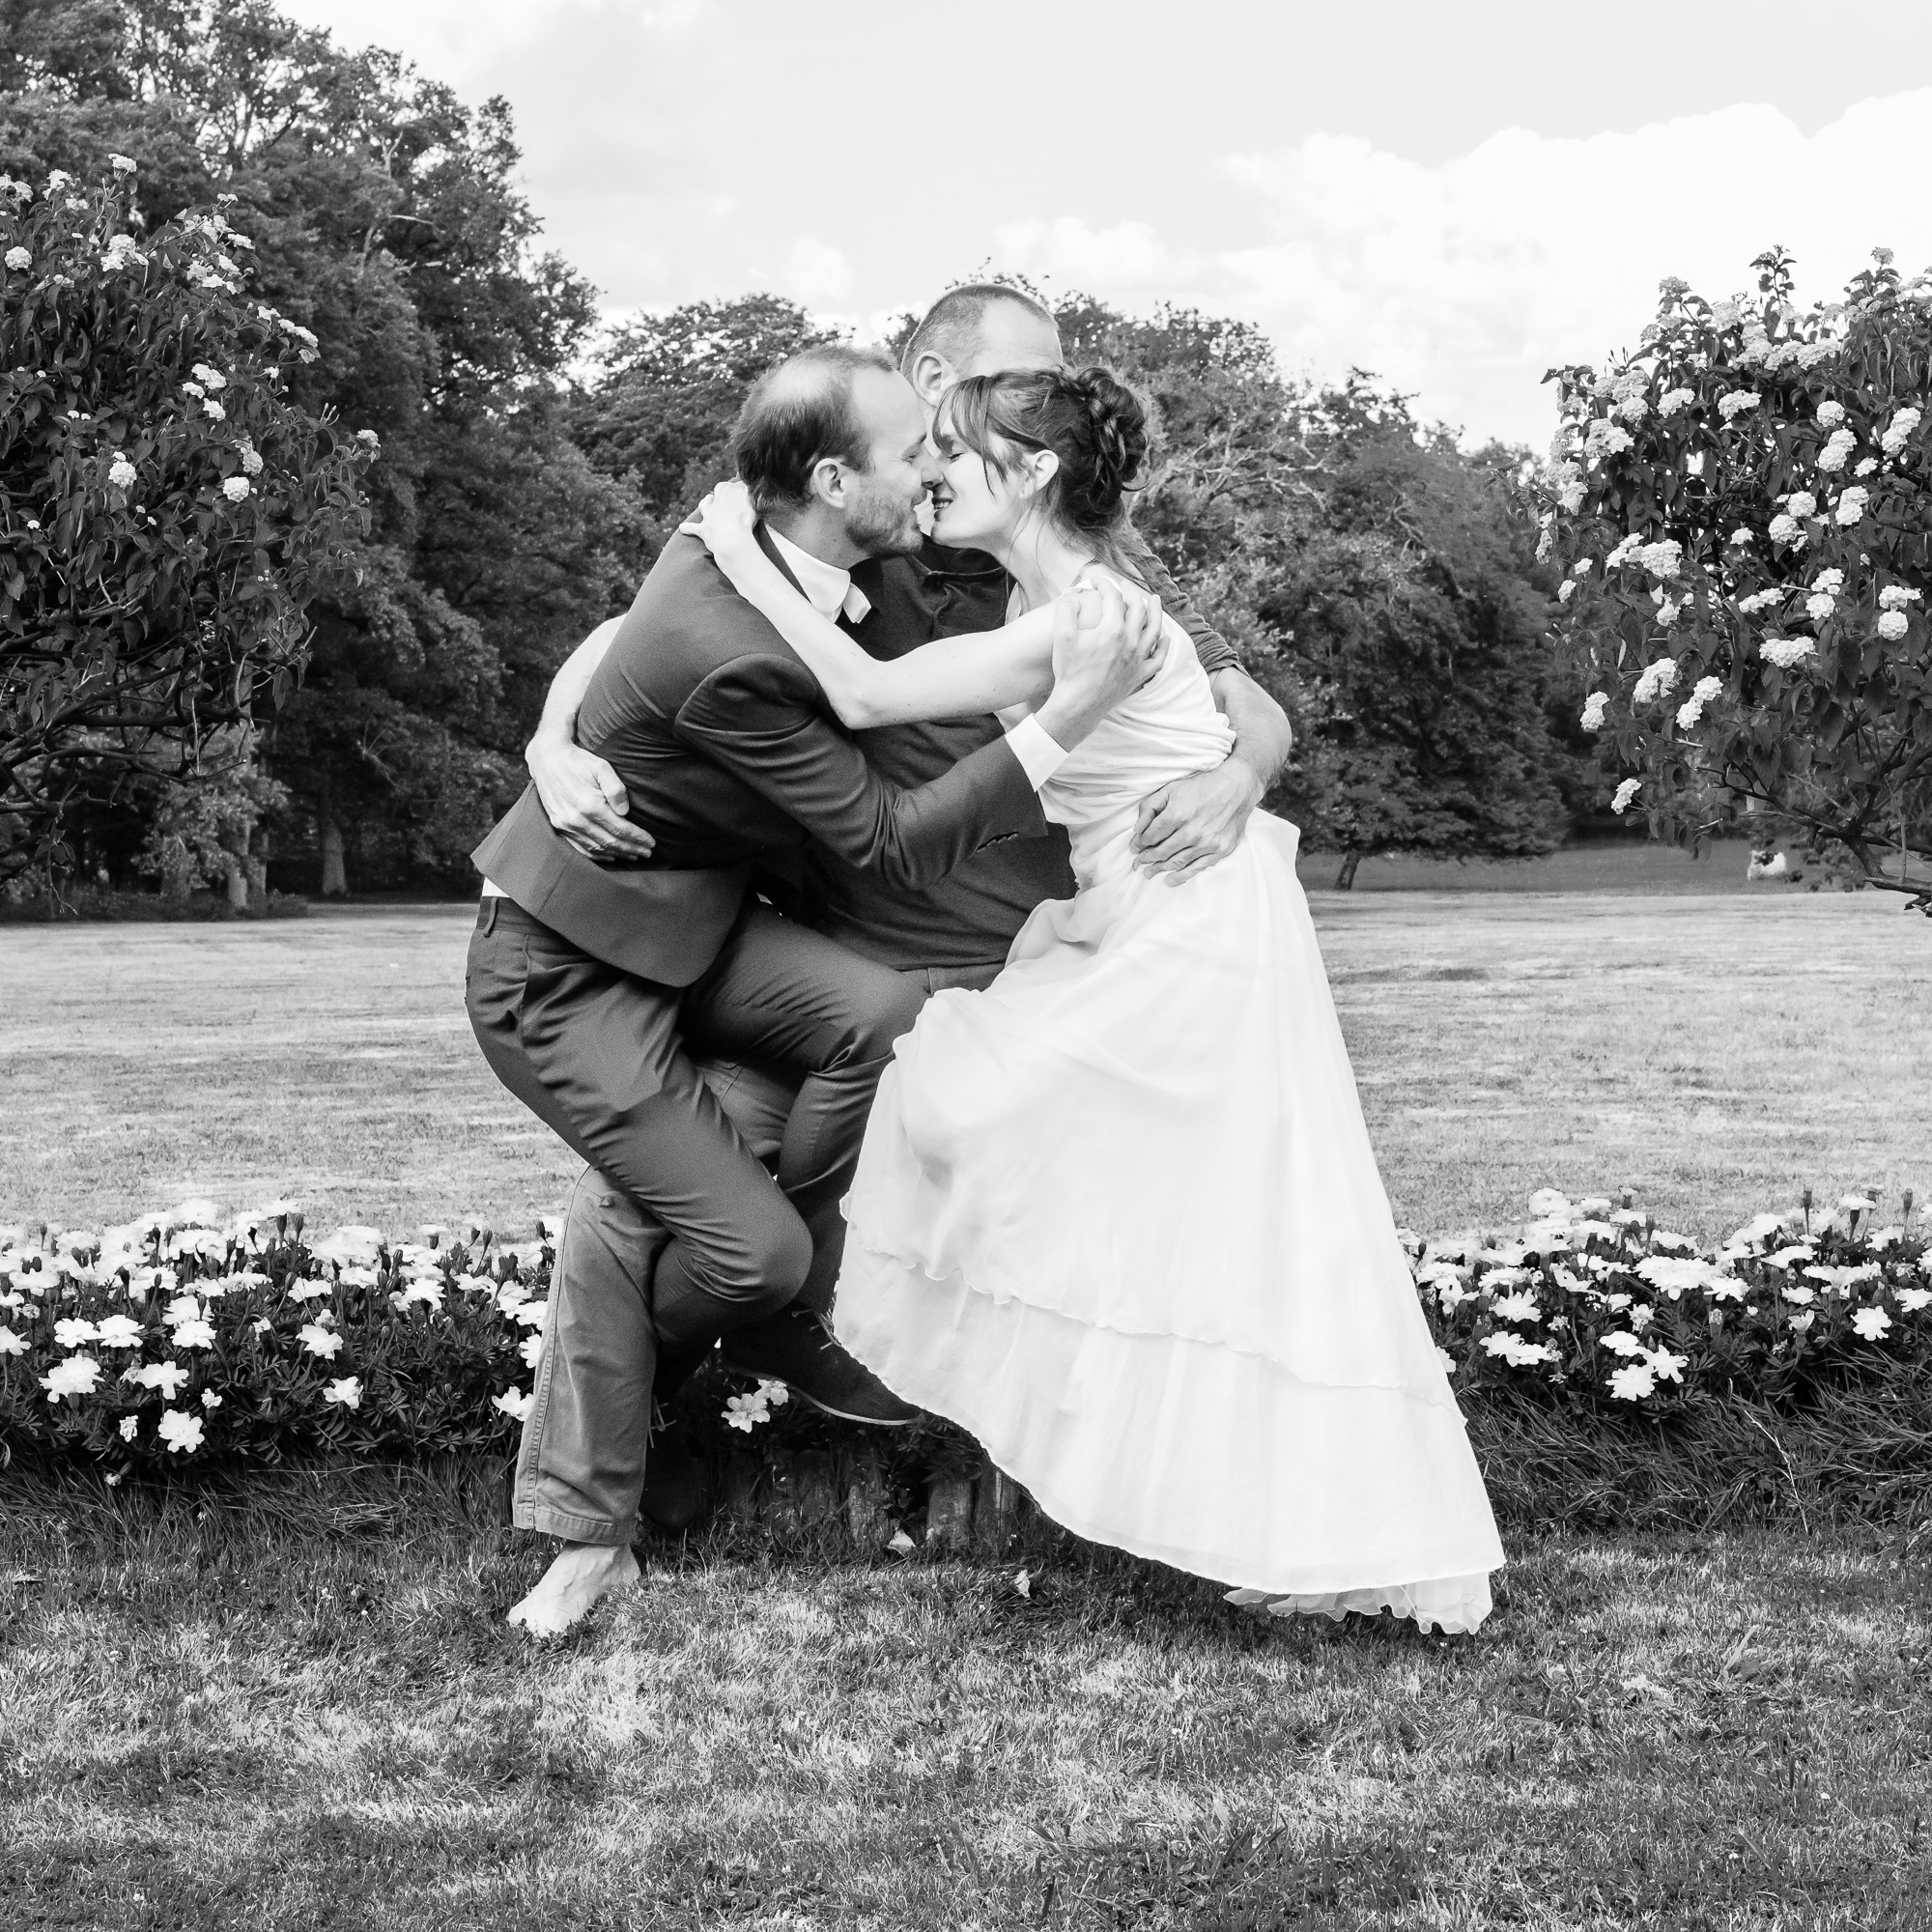 Mariage_2017_-_Les_mariés